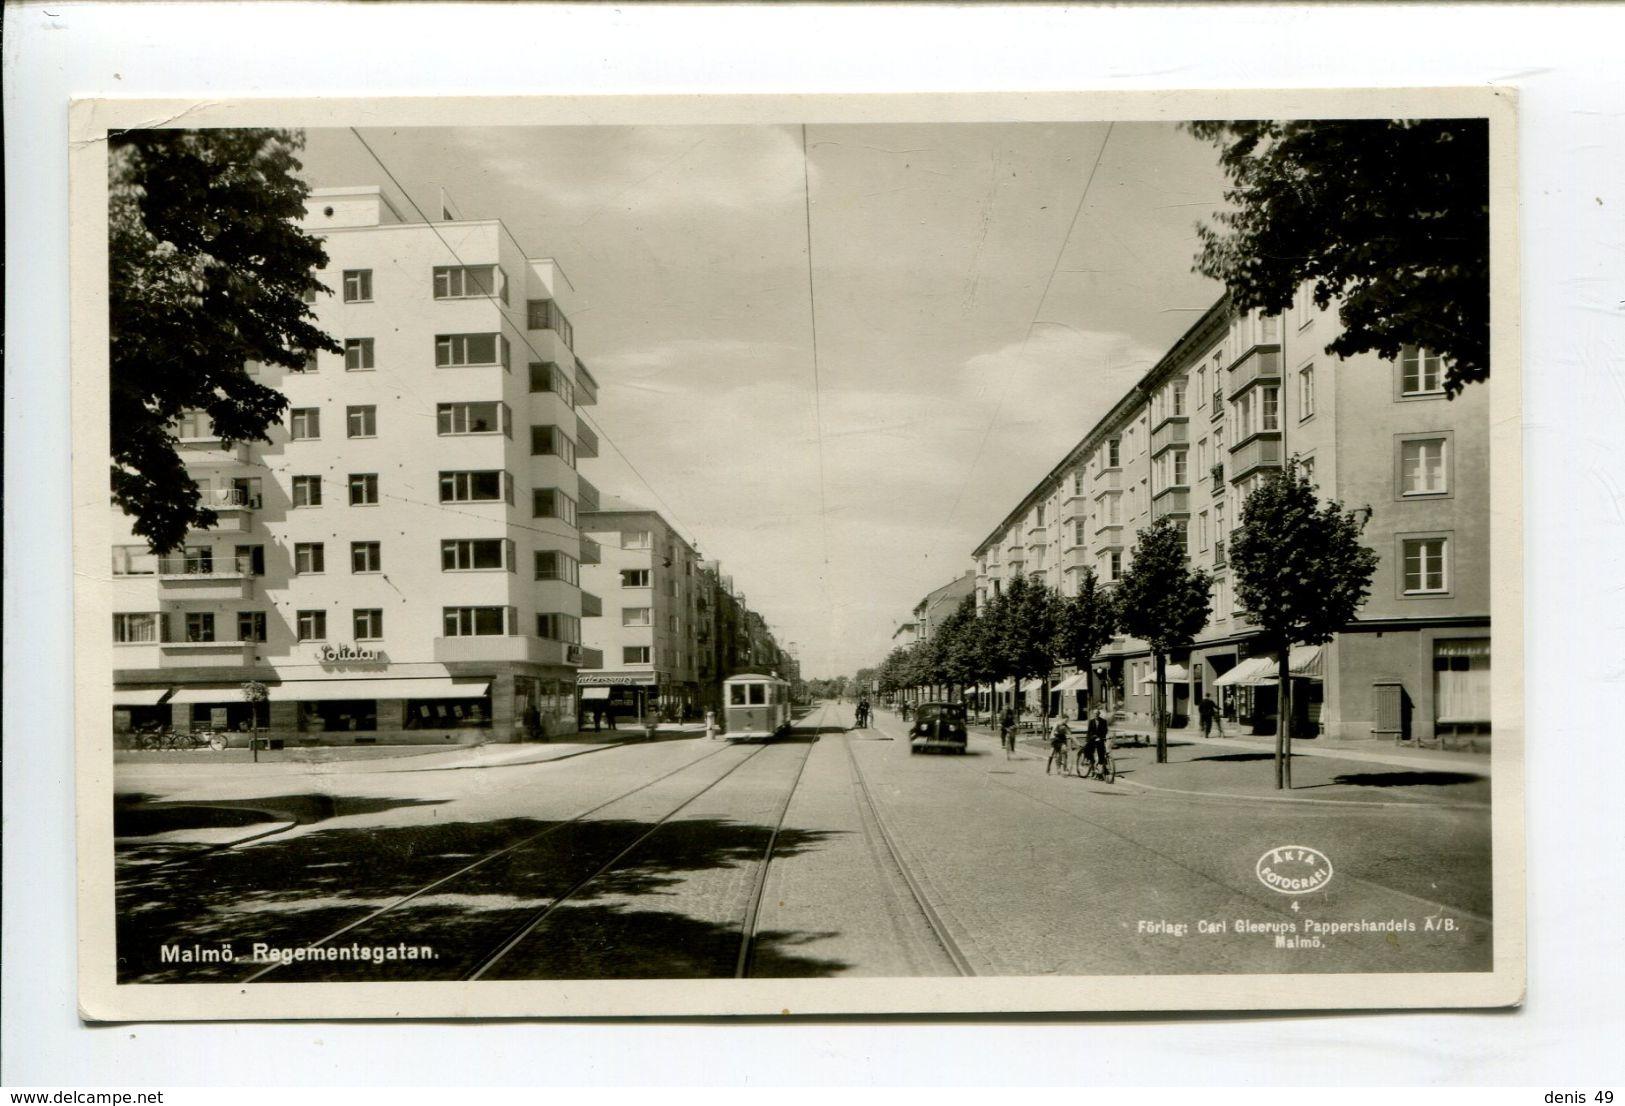 Malmö Regementagatan - Zweden